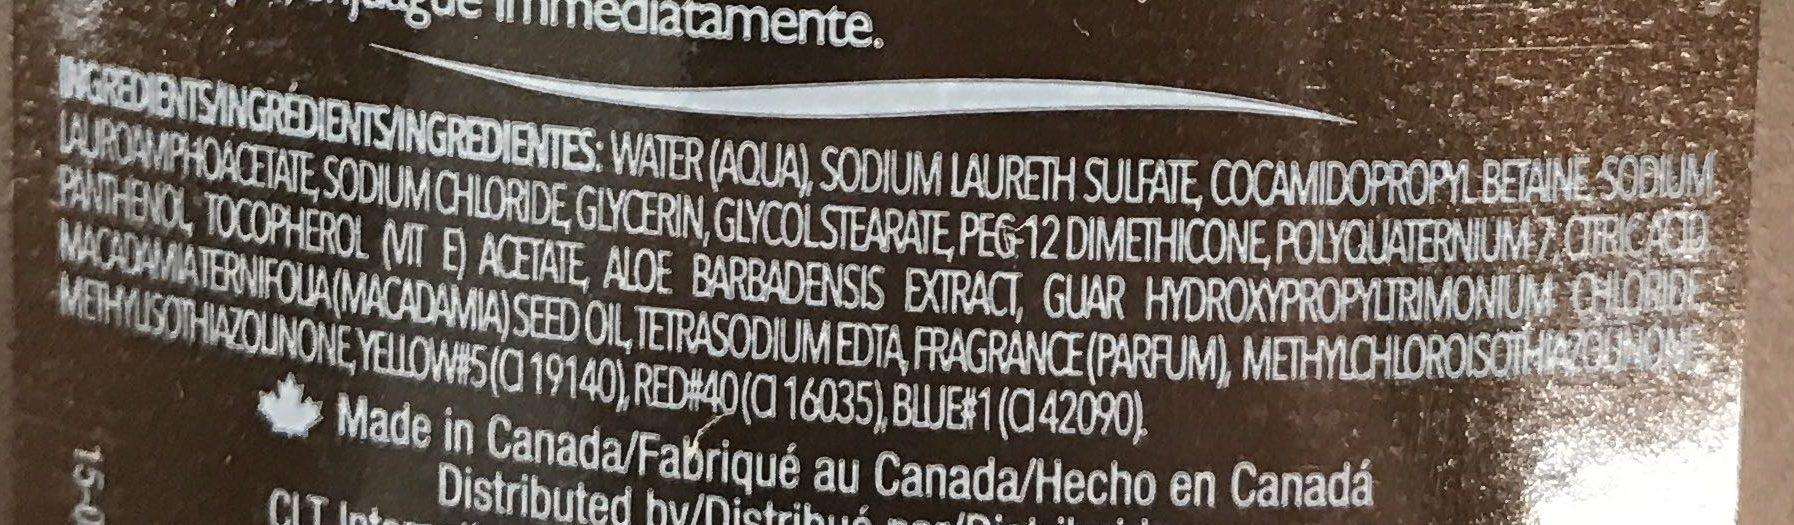 Nettoyant Corporel Hydratant Huile de Macadamia - Ingredients - fr